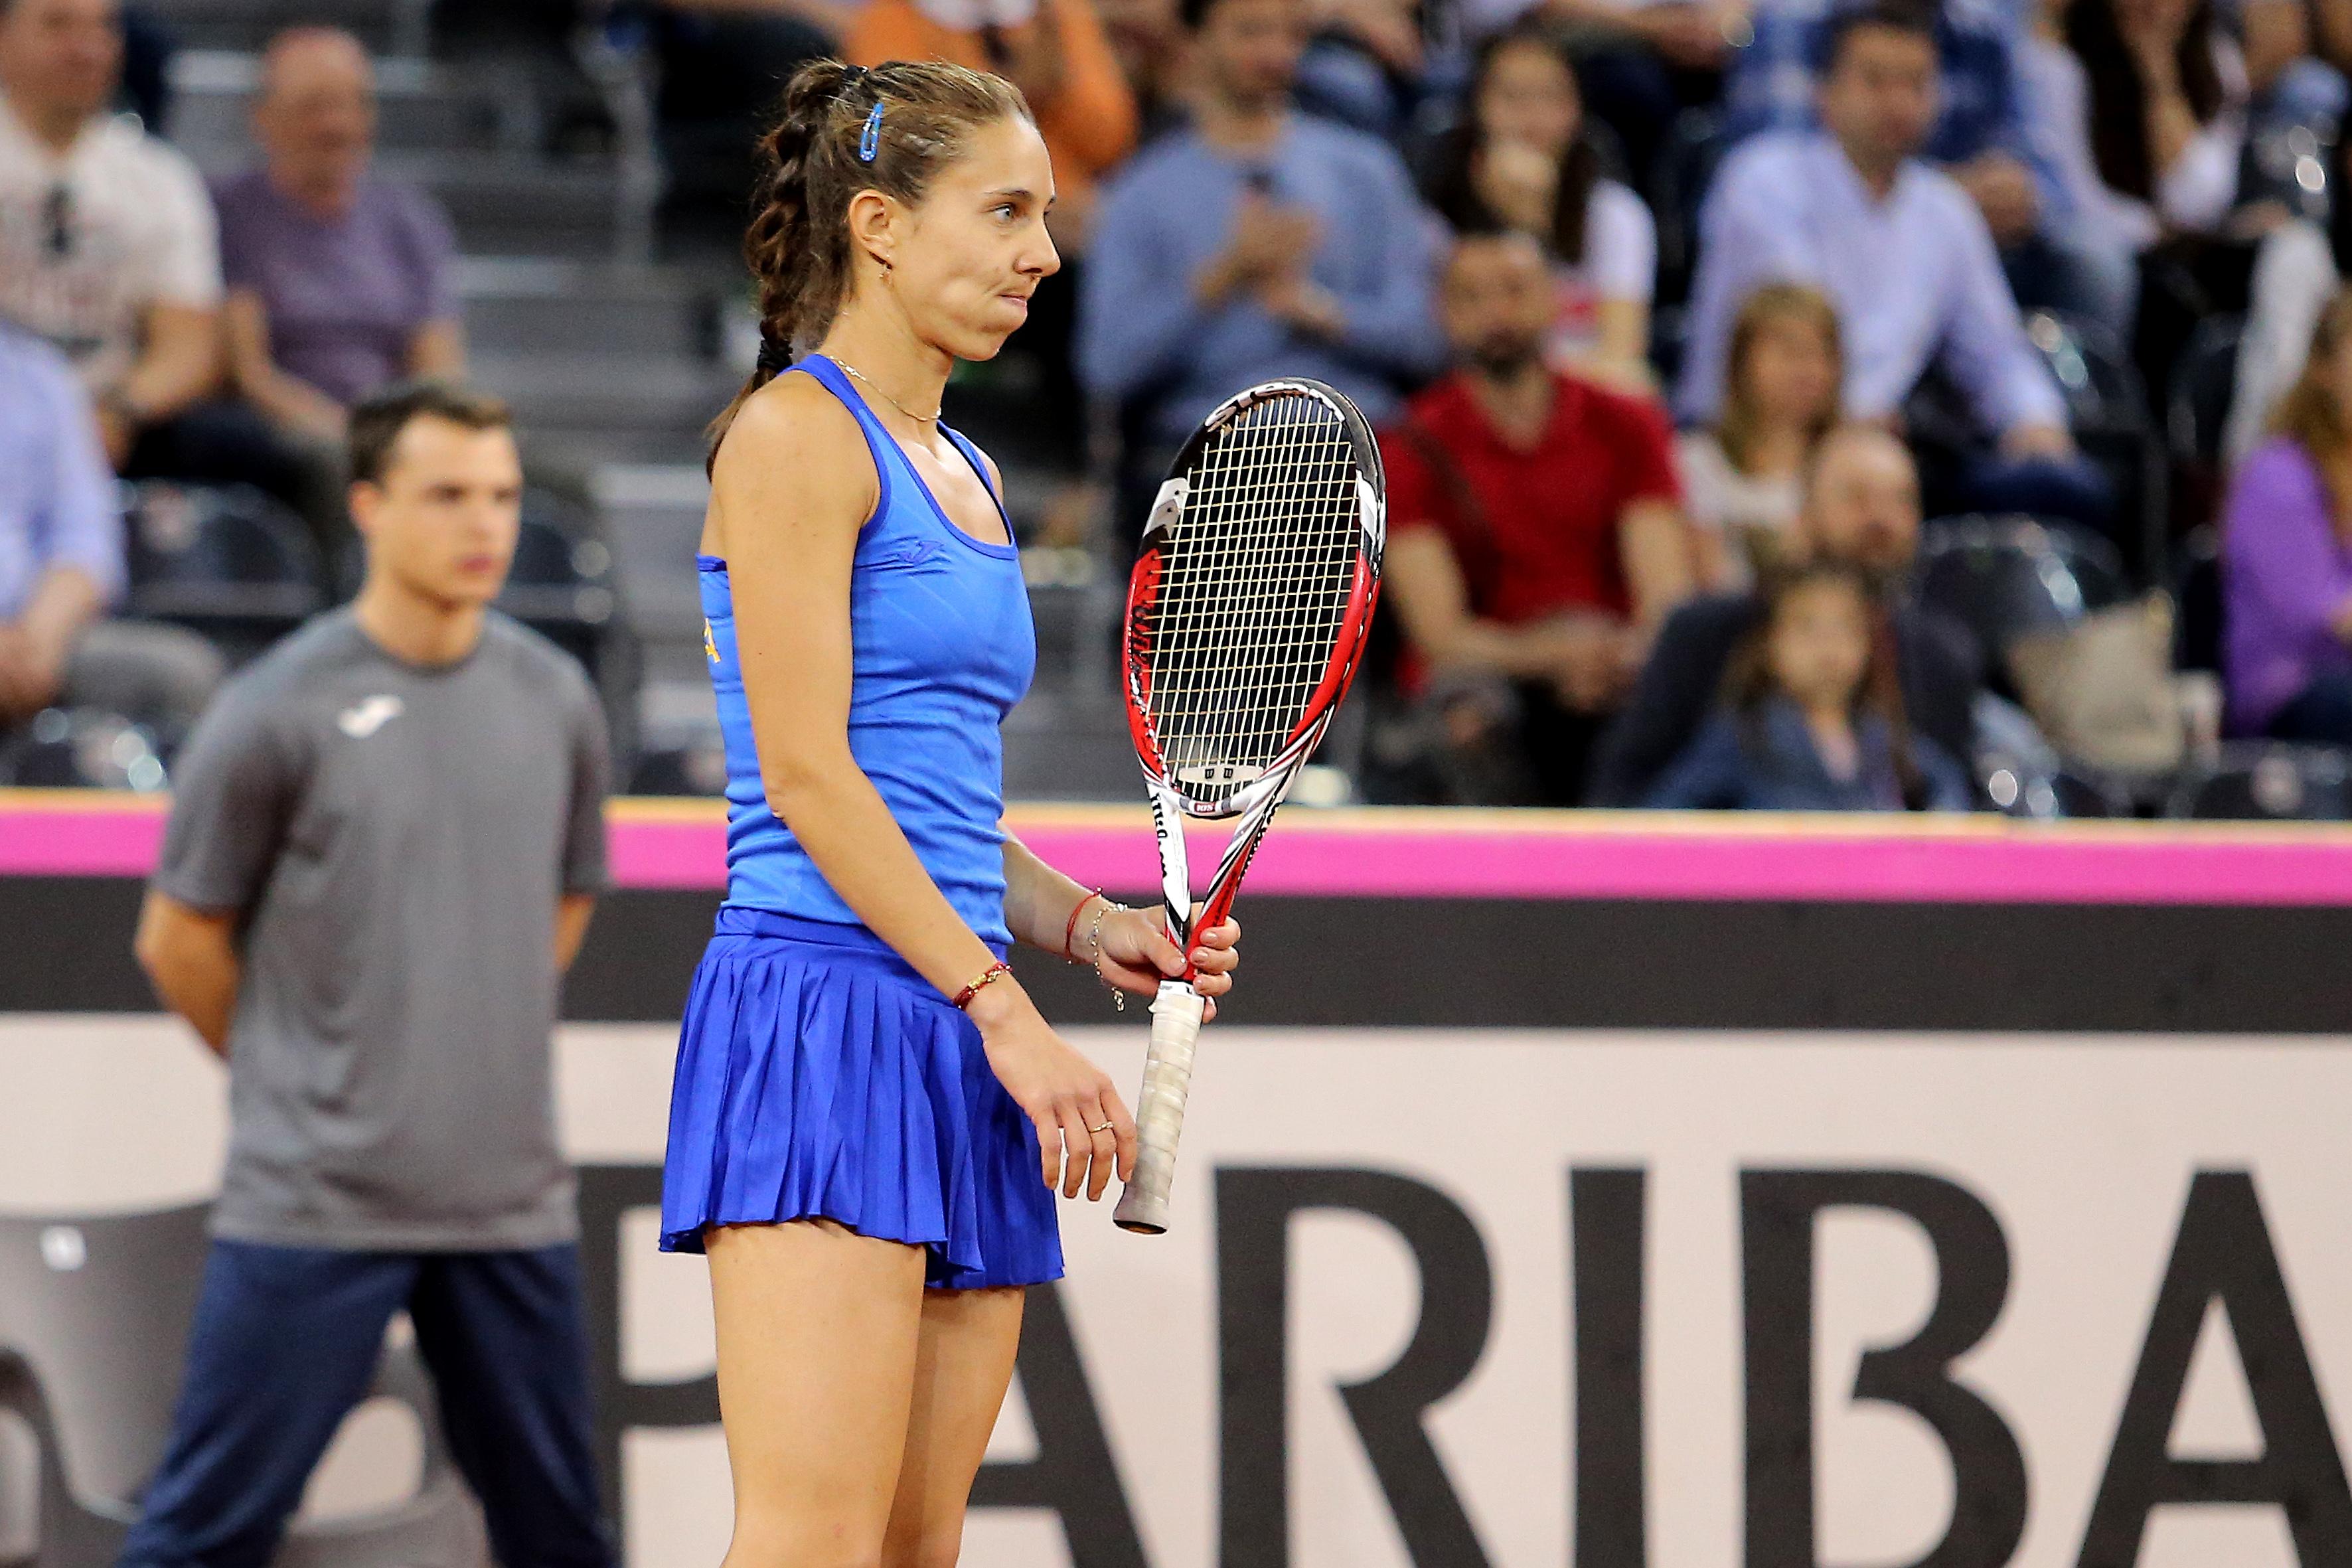 Mihaela Buzarnescu a ramas profund dezamagita de reactia Federatiei Romane de Tenis